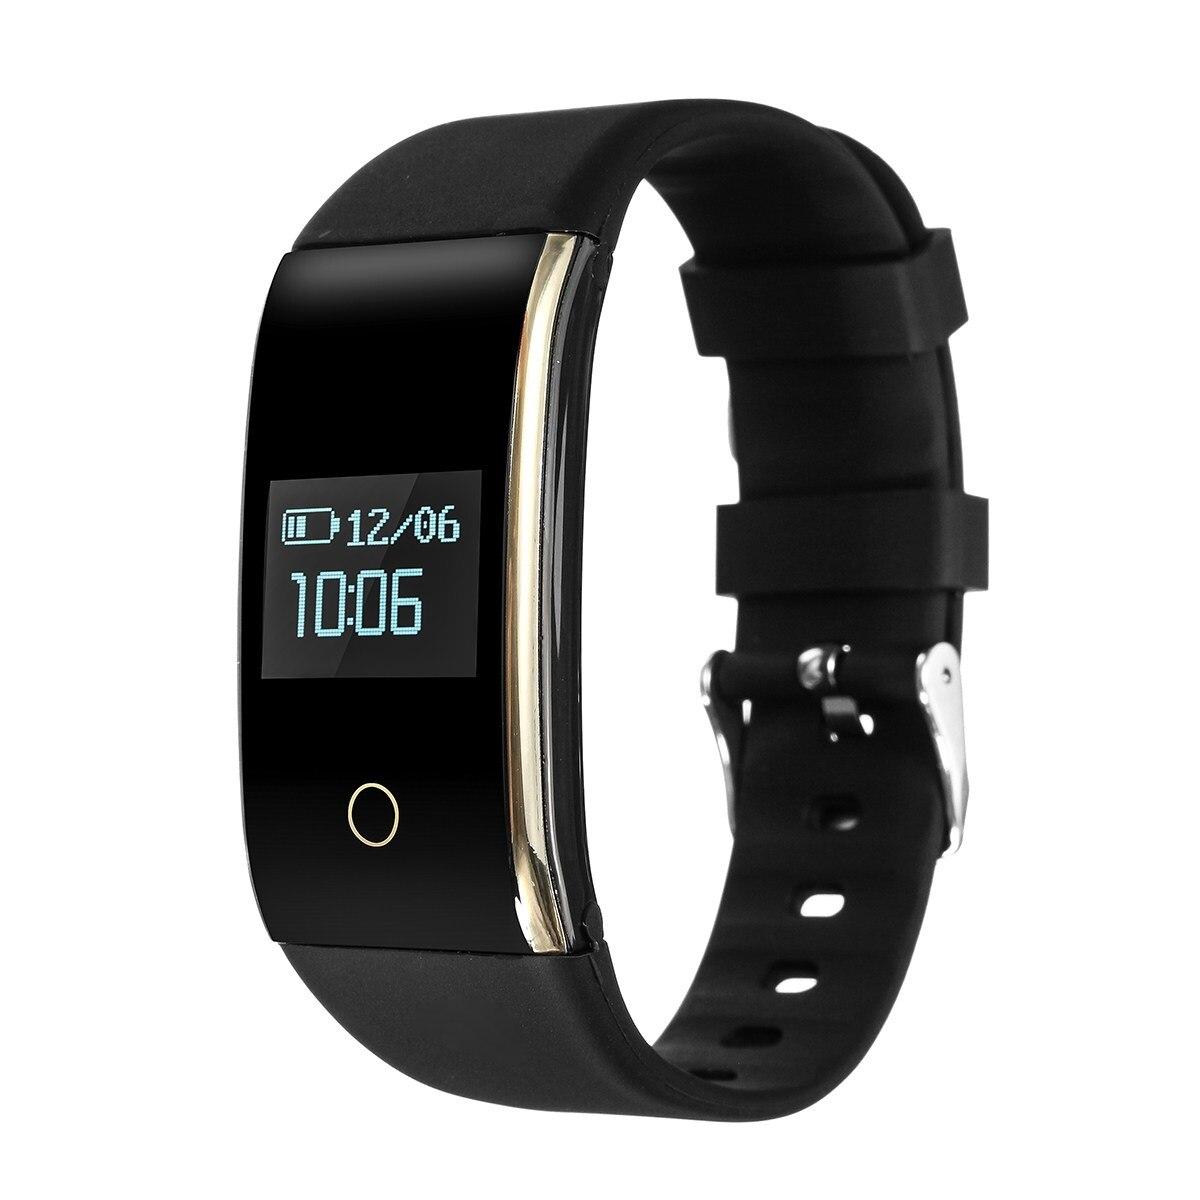 Brand New 0.66Inch OLED Screen IP67 Waterproof Smart Bracelet Watch Wristband Sport Fitness Track Heart Rate Monitor